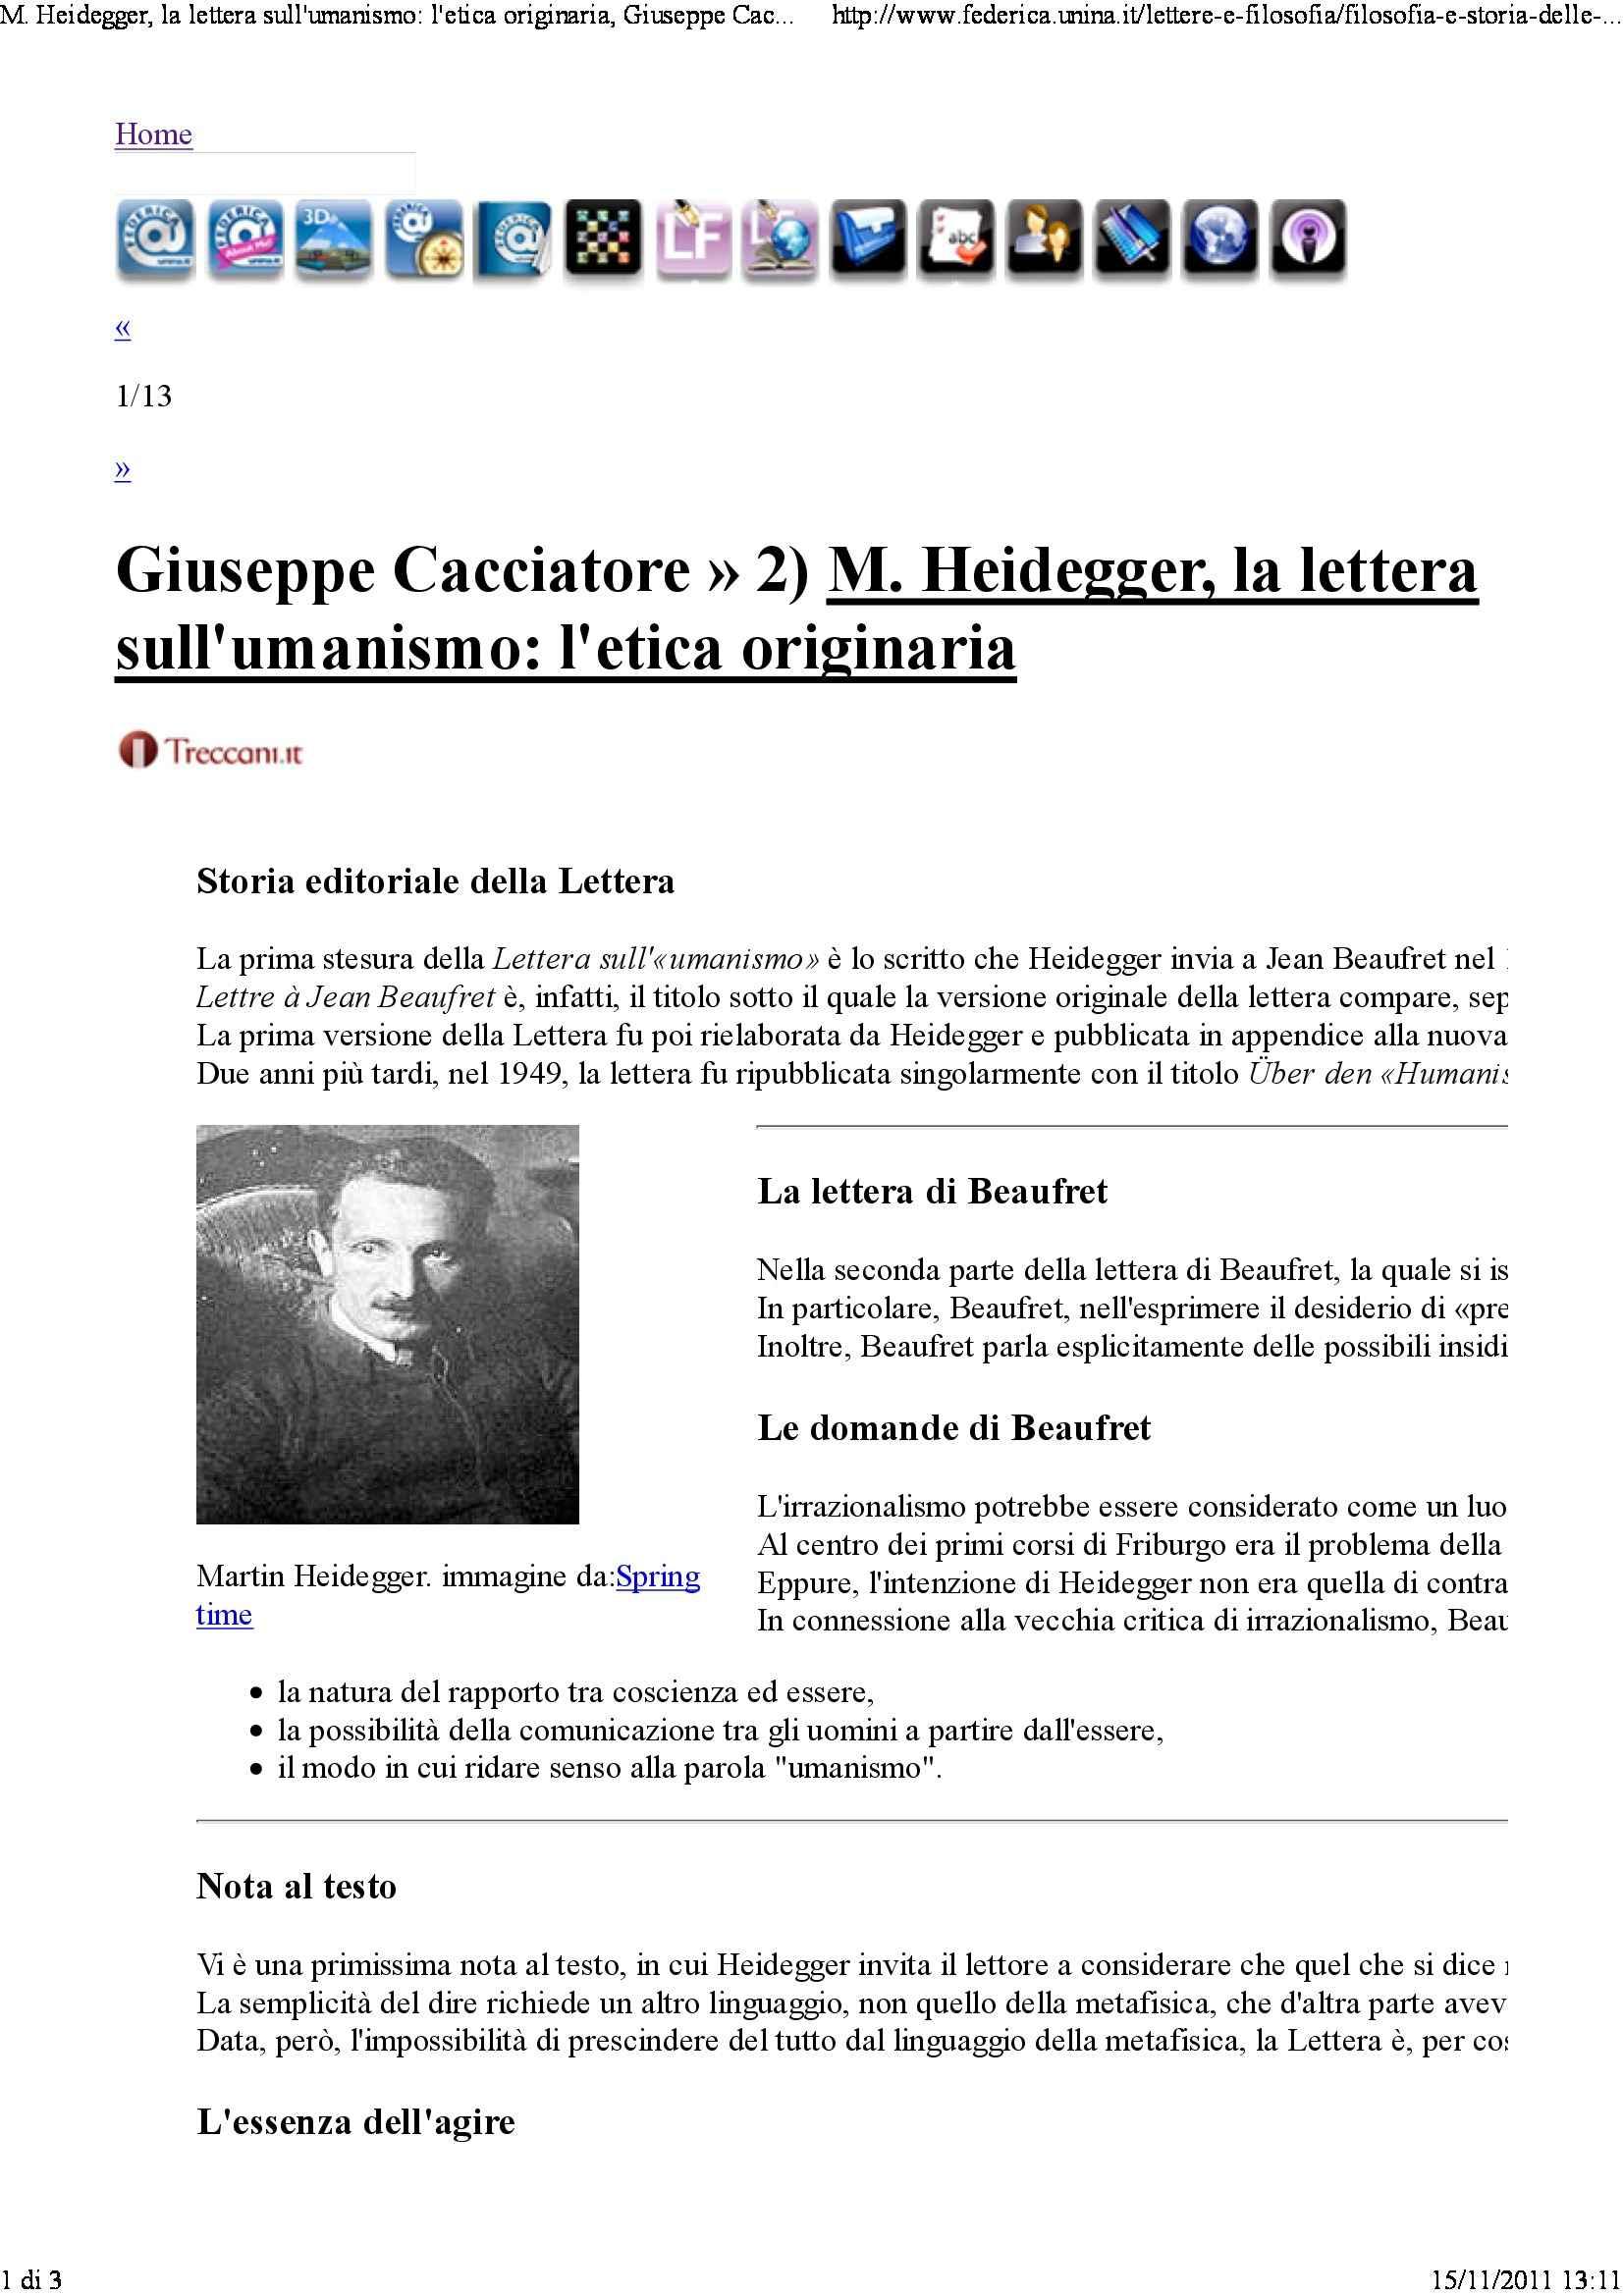 Heidegger, la lettera sull'umanesimo